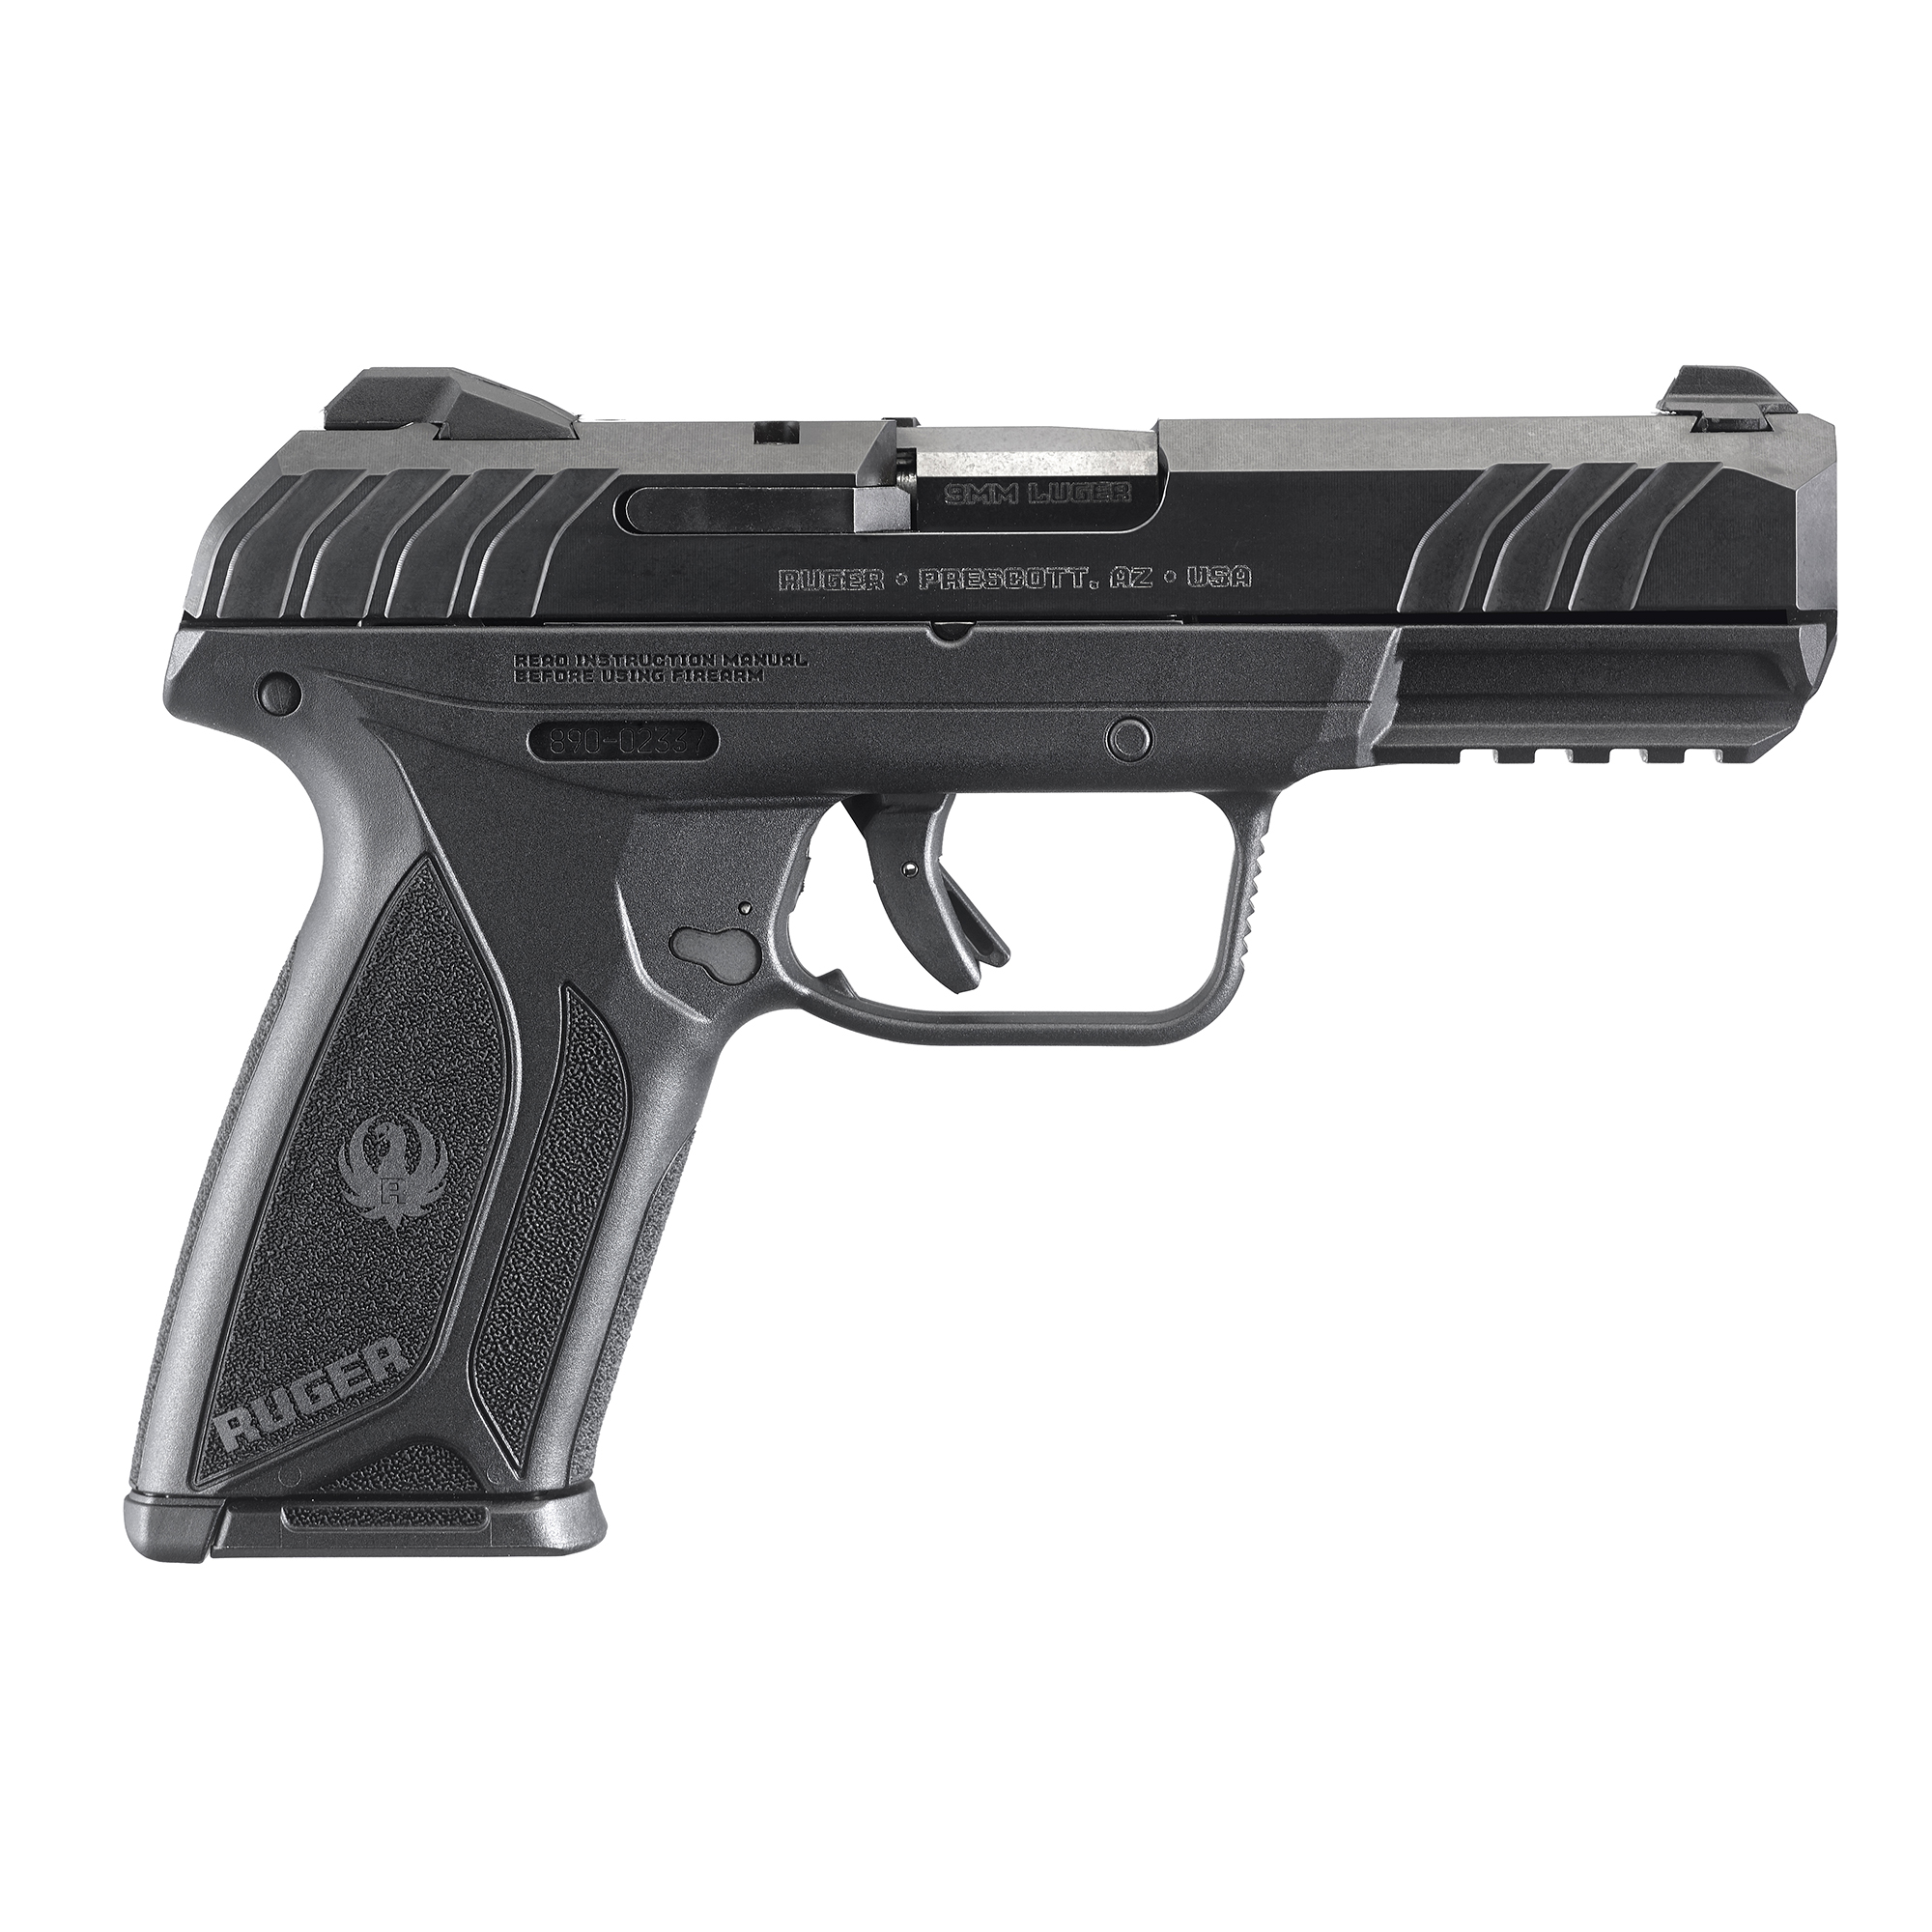 Ruger Security-9 Handgun, 10 Rd.